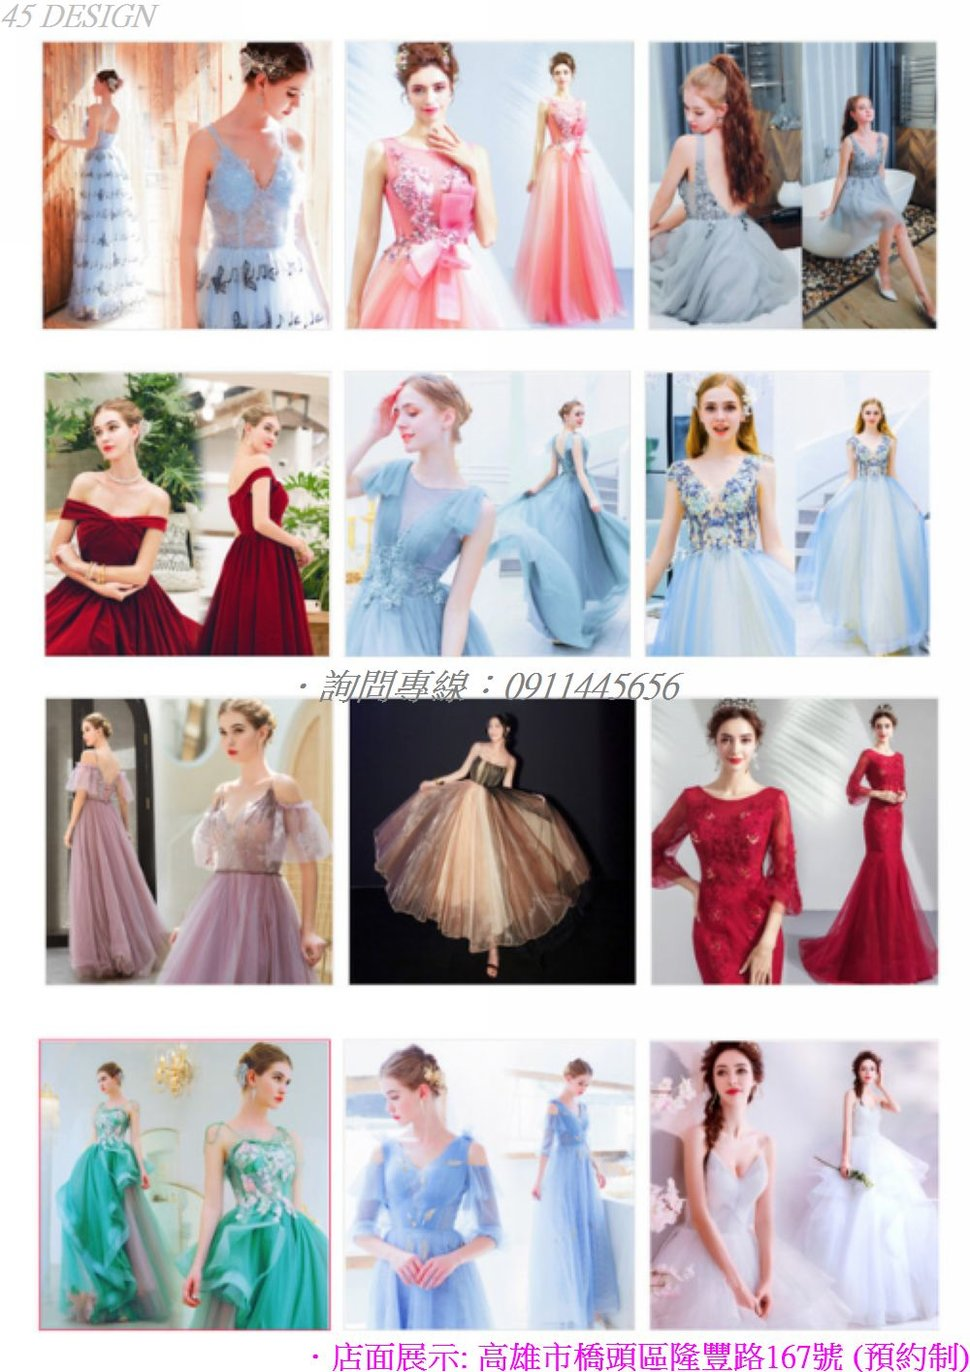 msl190815A45163B0BABE499DA59168AFDF90136C - 全台最便宜-45DESIGN四五婚紗禮服《結婚吧》